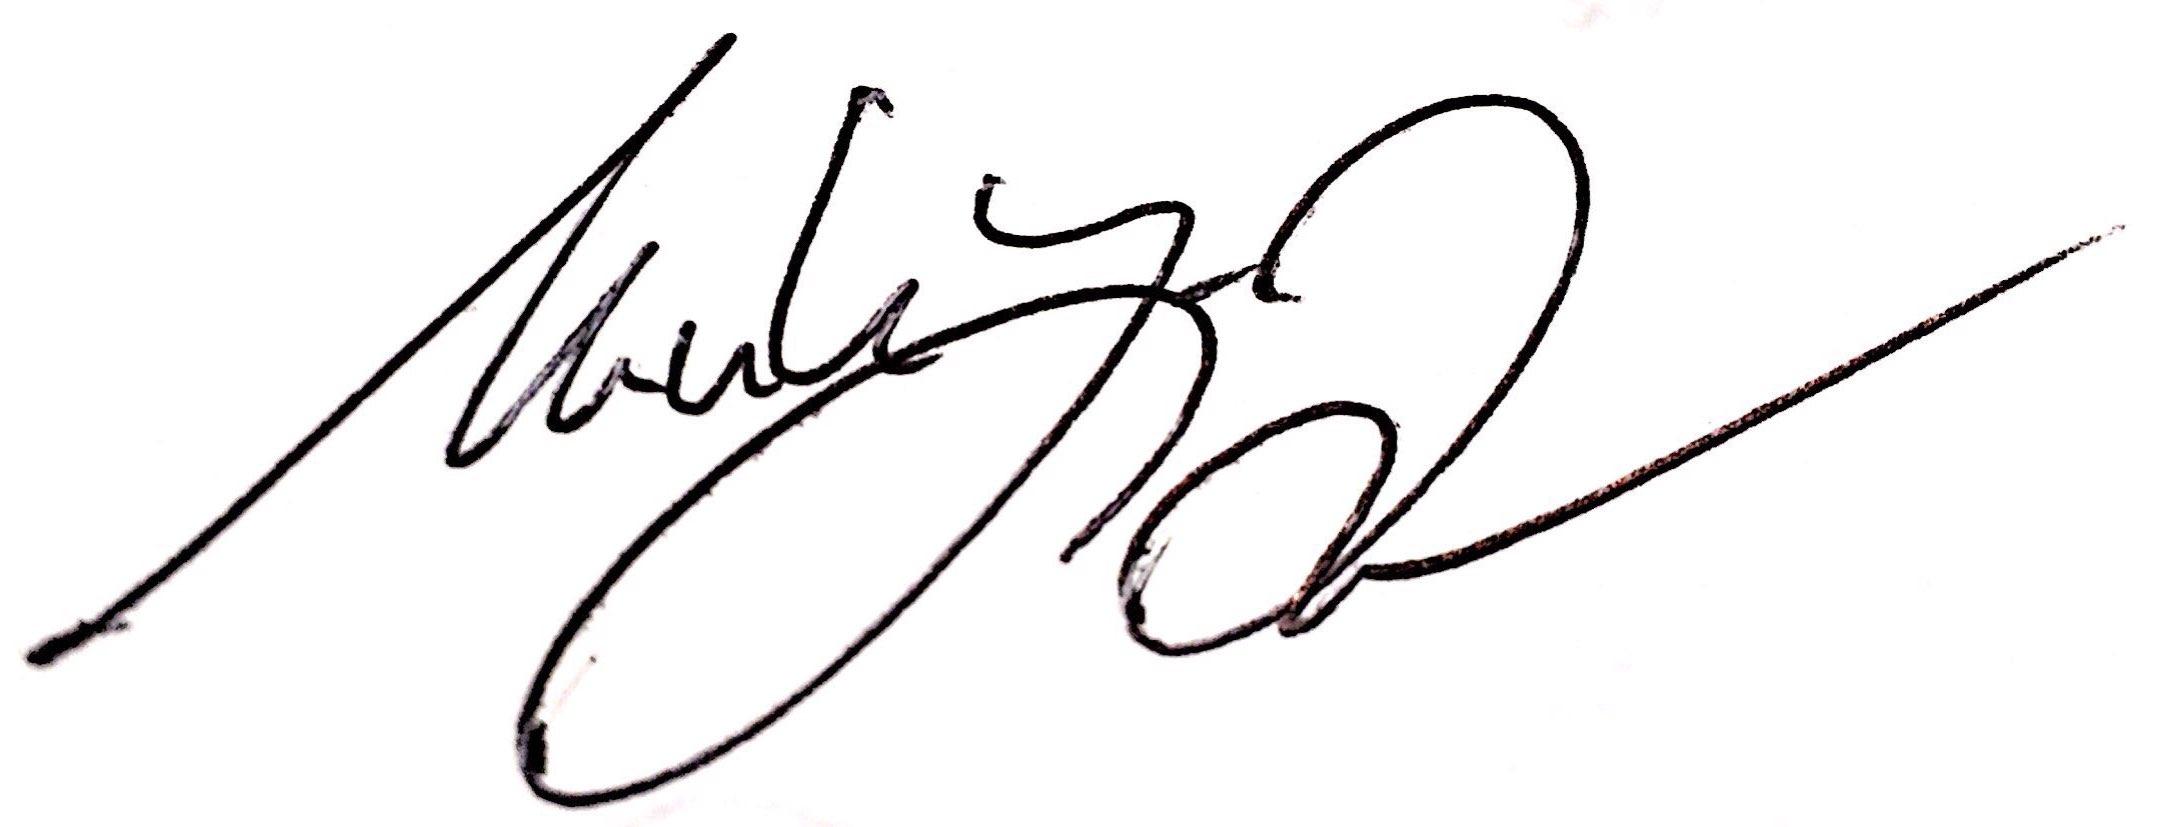 Signature New.jpg